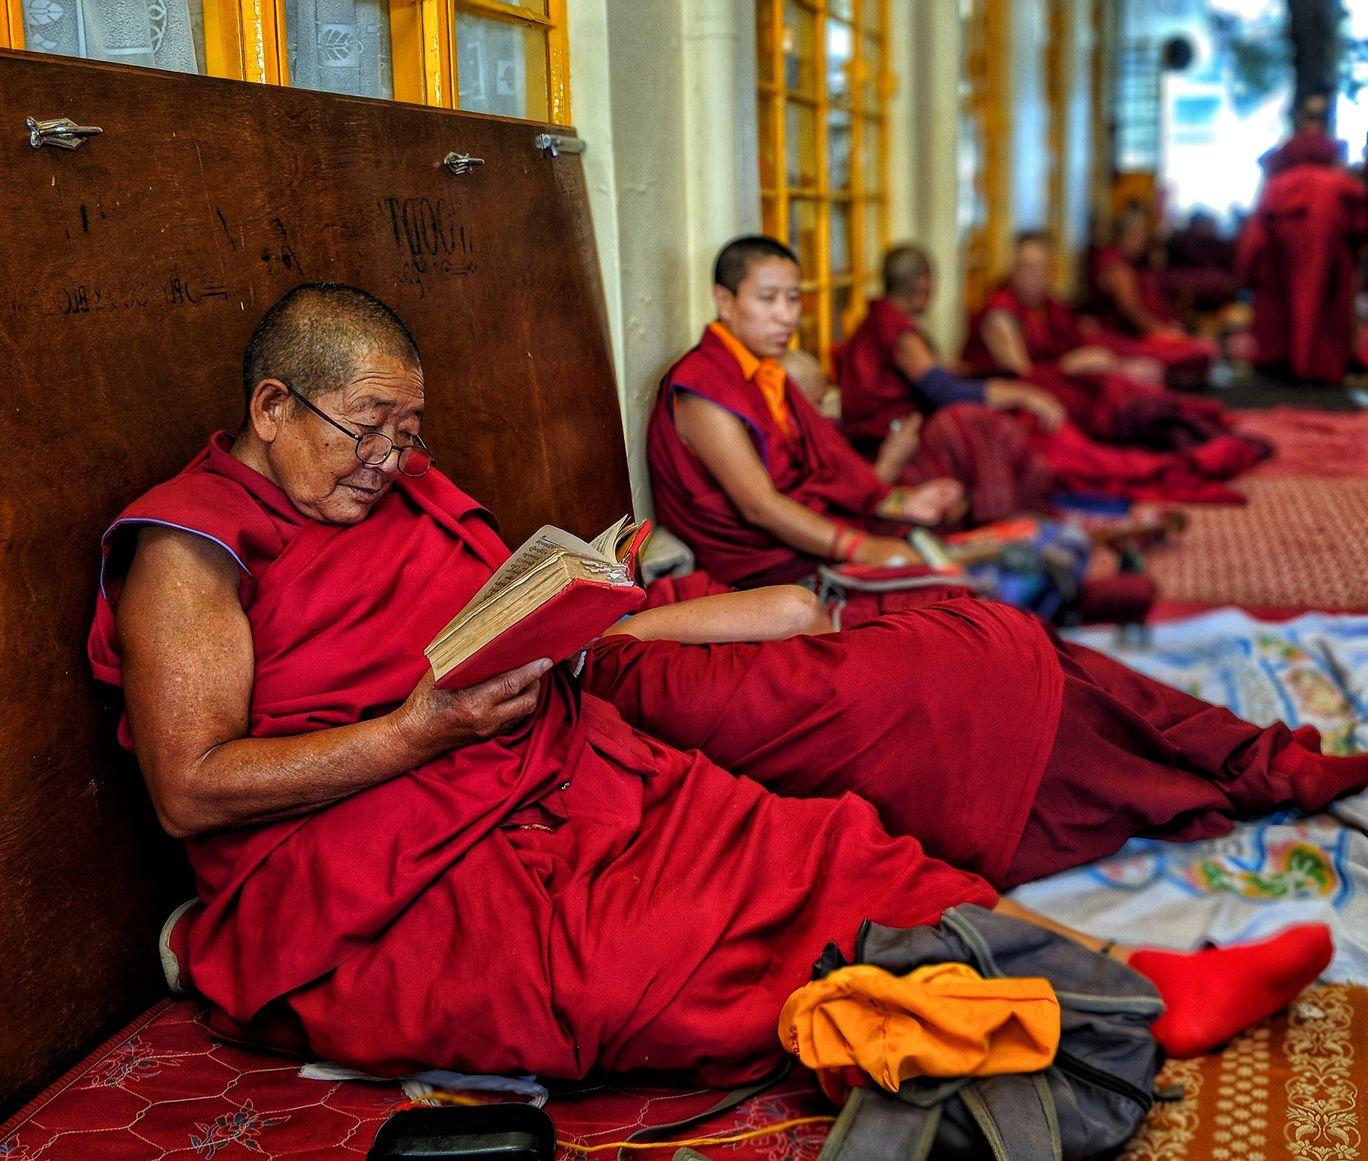 Photo of His Holiness Dalai Lama Main Temple By Sakshi Gandhi